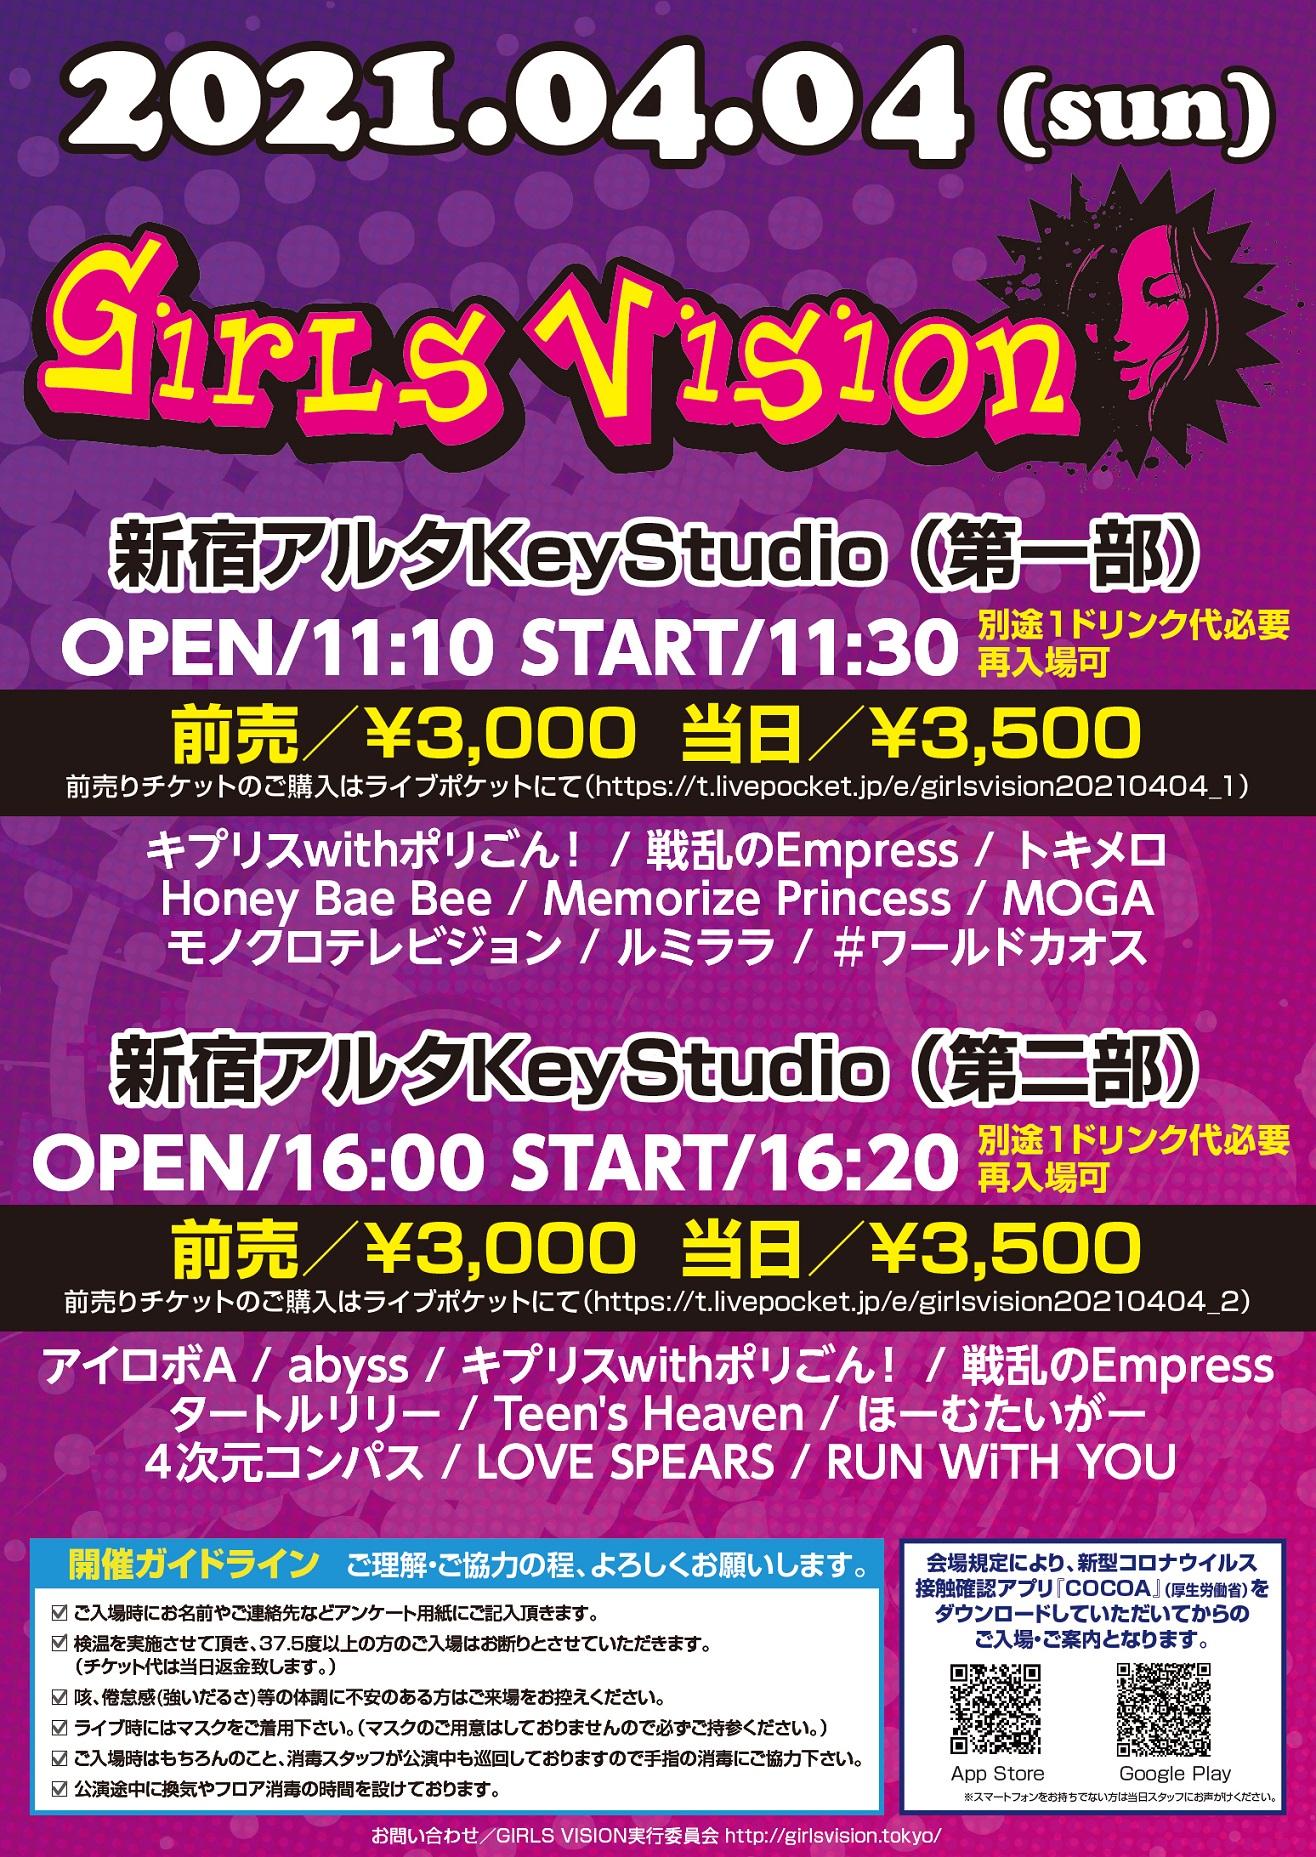 GIRLS VISION@新宿アルタKeyStudio(第一部)